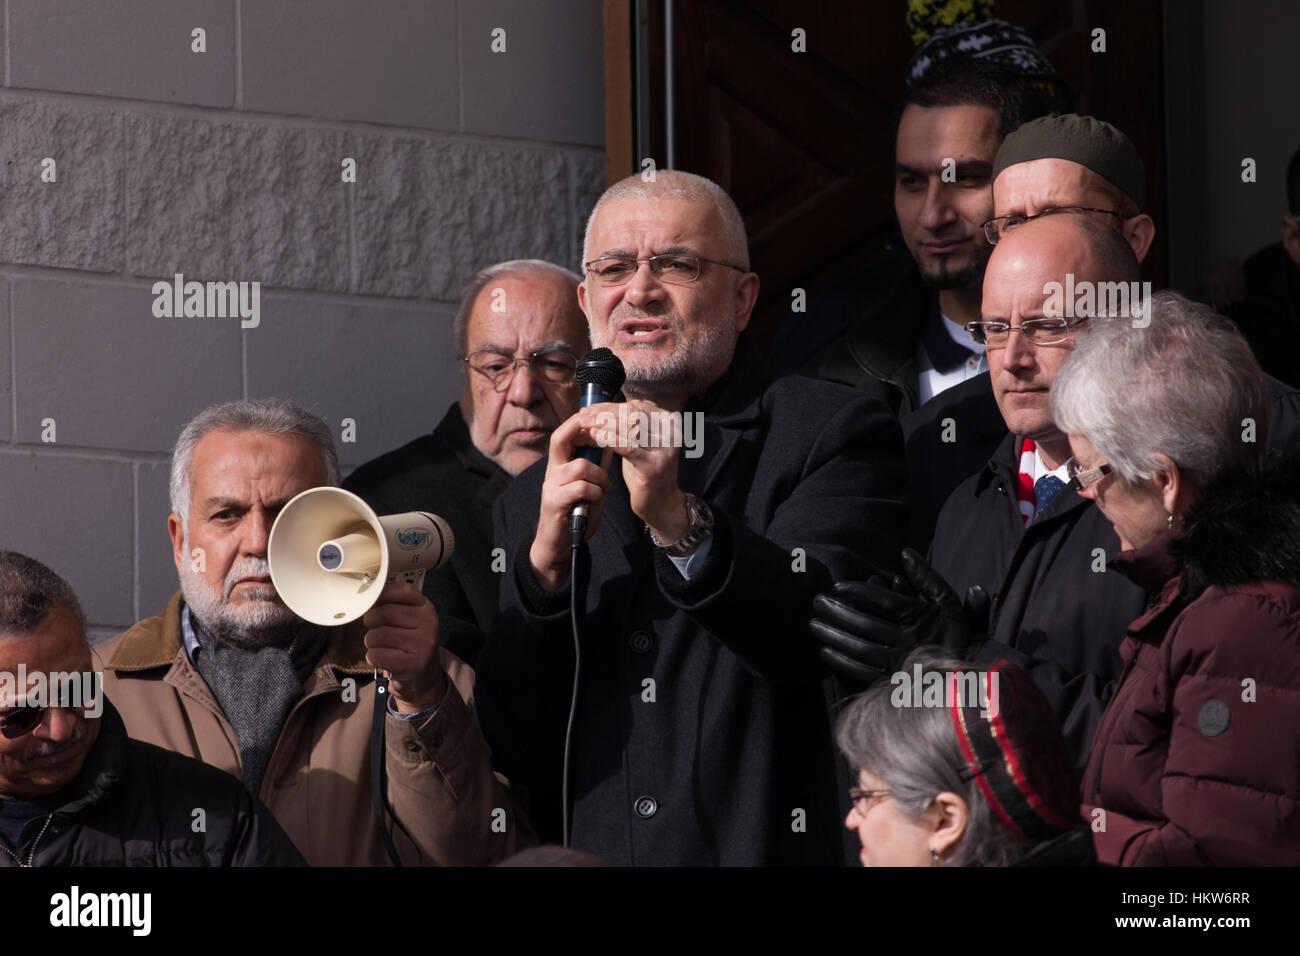 London, UK. 29th Jan, 2017. Munir El-Kassem, imam at the Islamic Centre of Southwestern Ontario speaks to Londoners - Stock Image